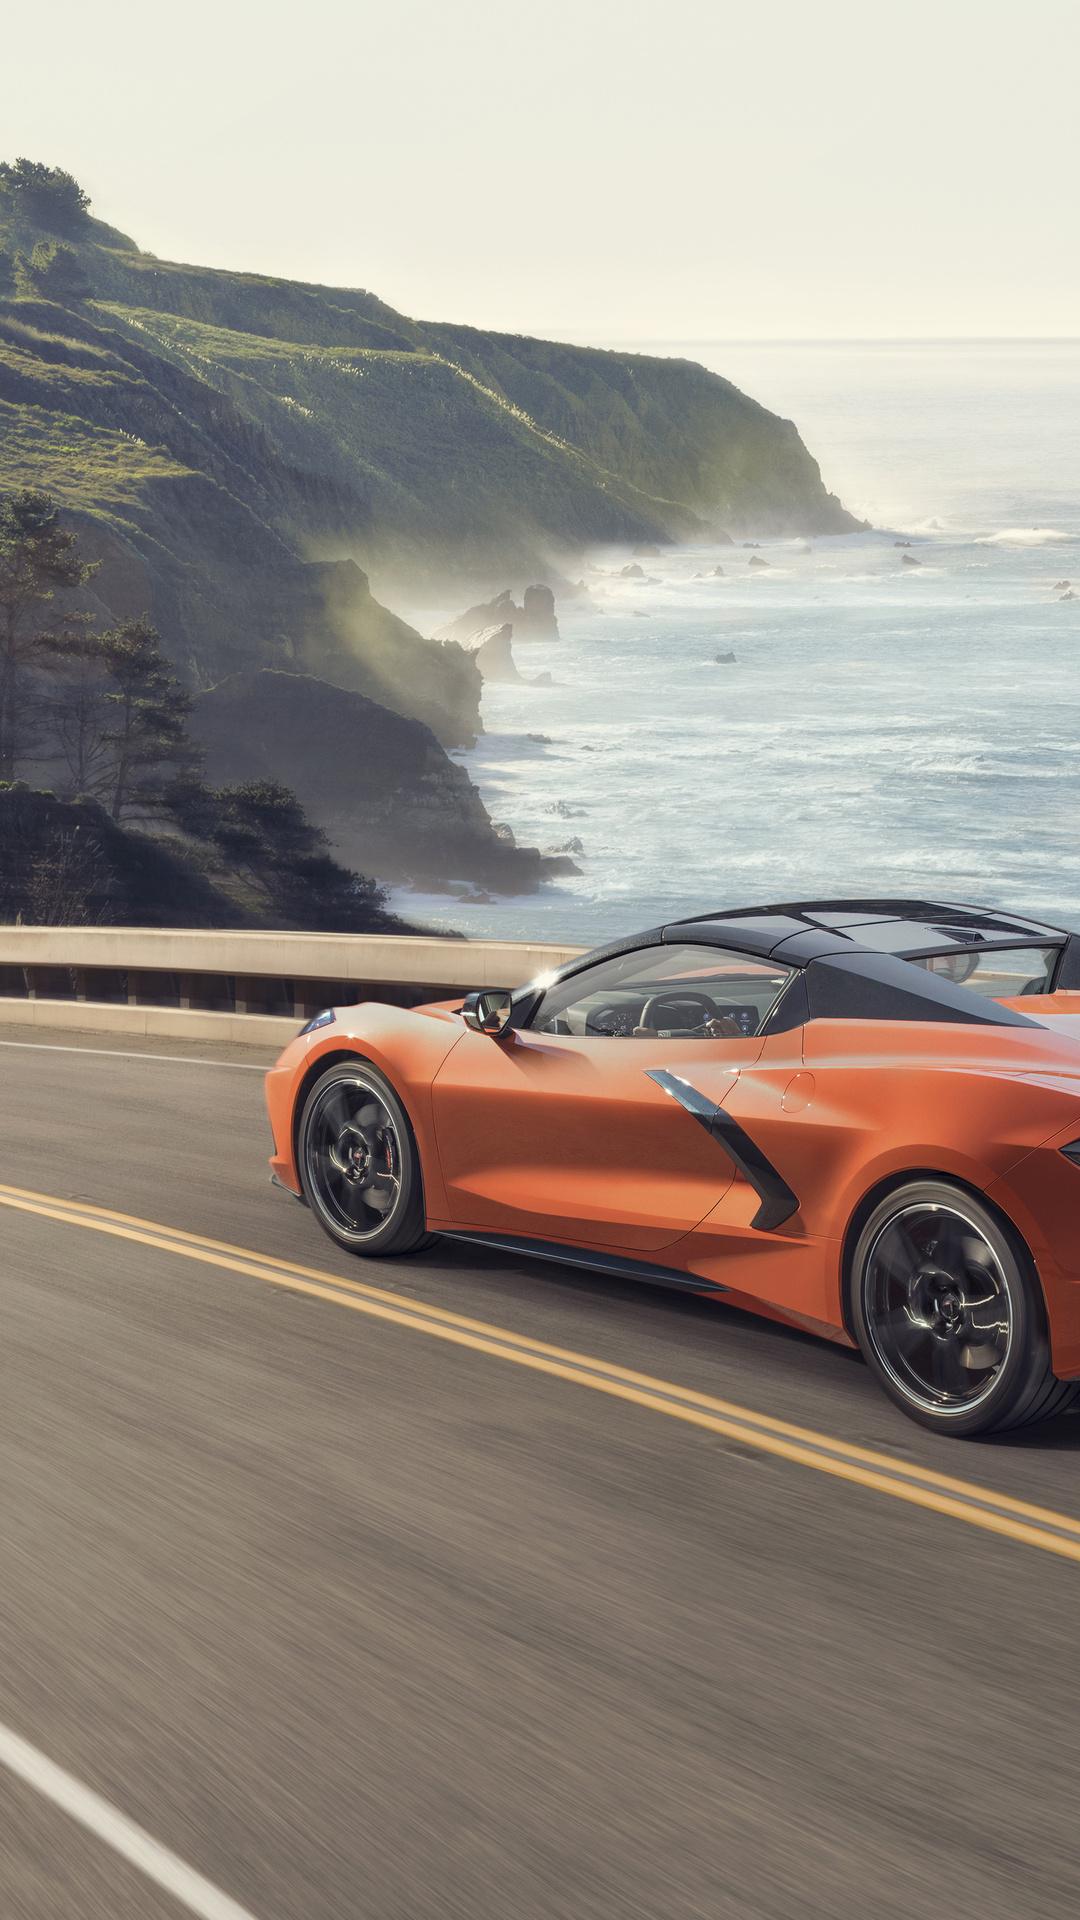 chevrolet-corvette-c8-stingray-convertible-2020-yp.jpg